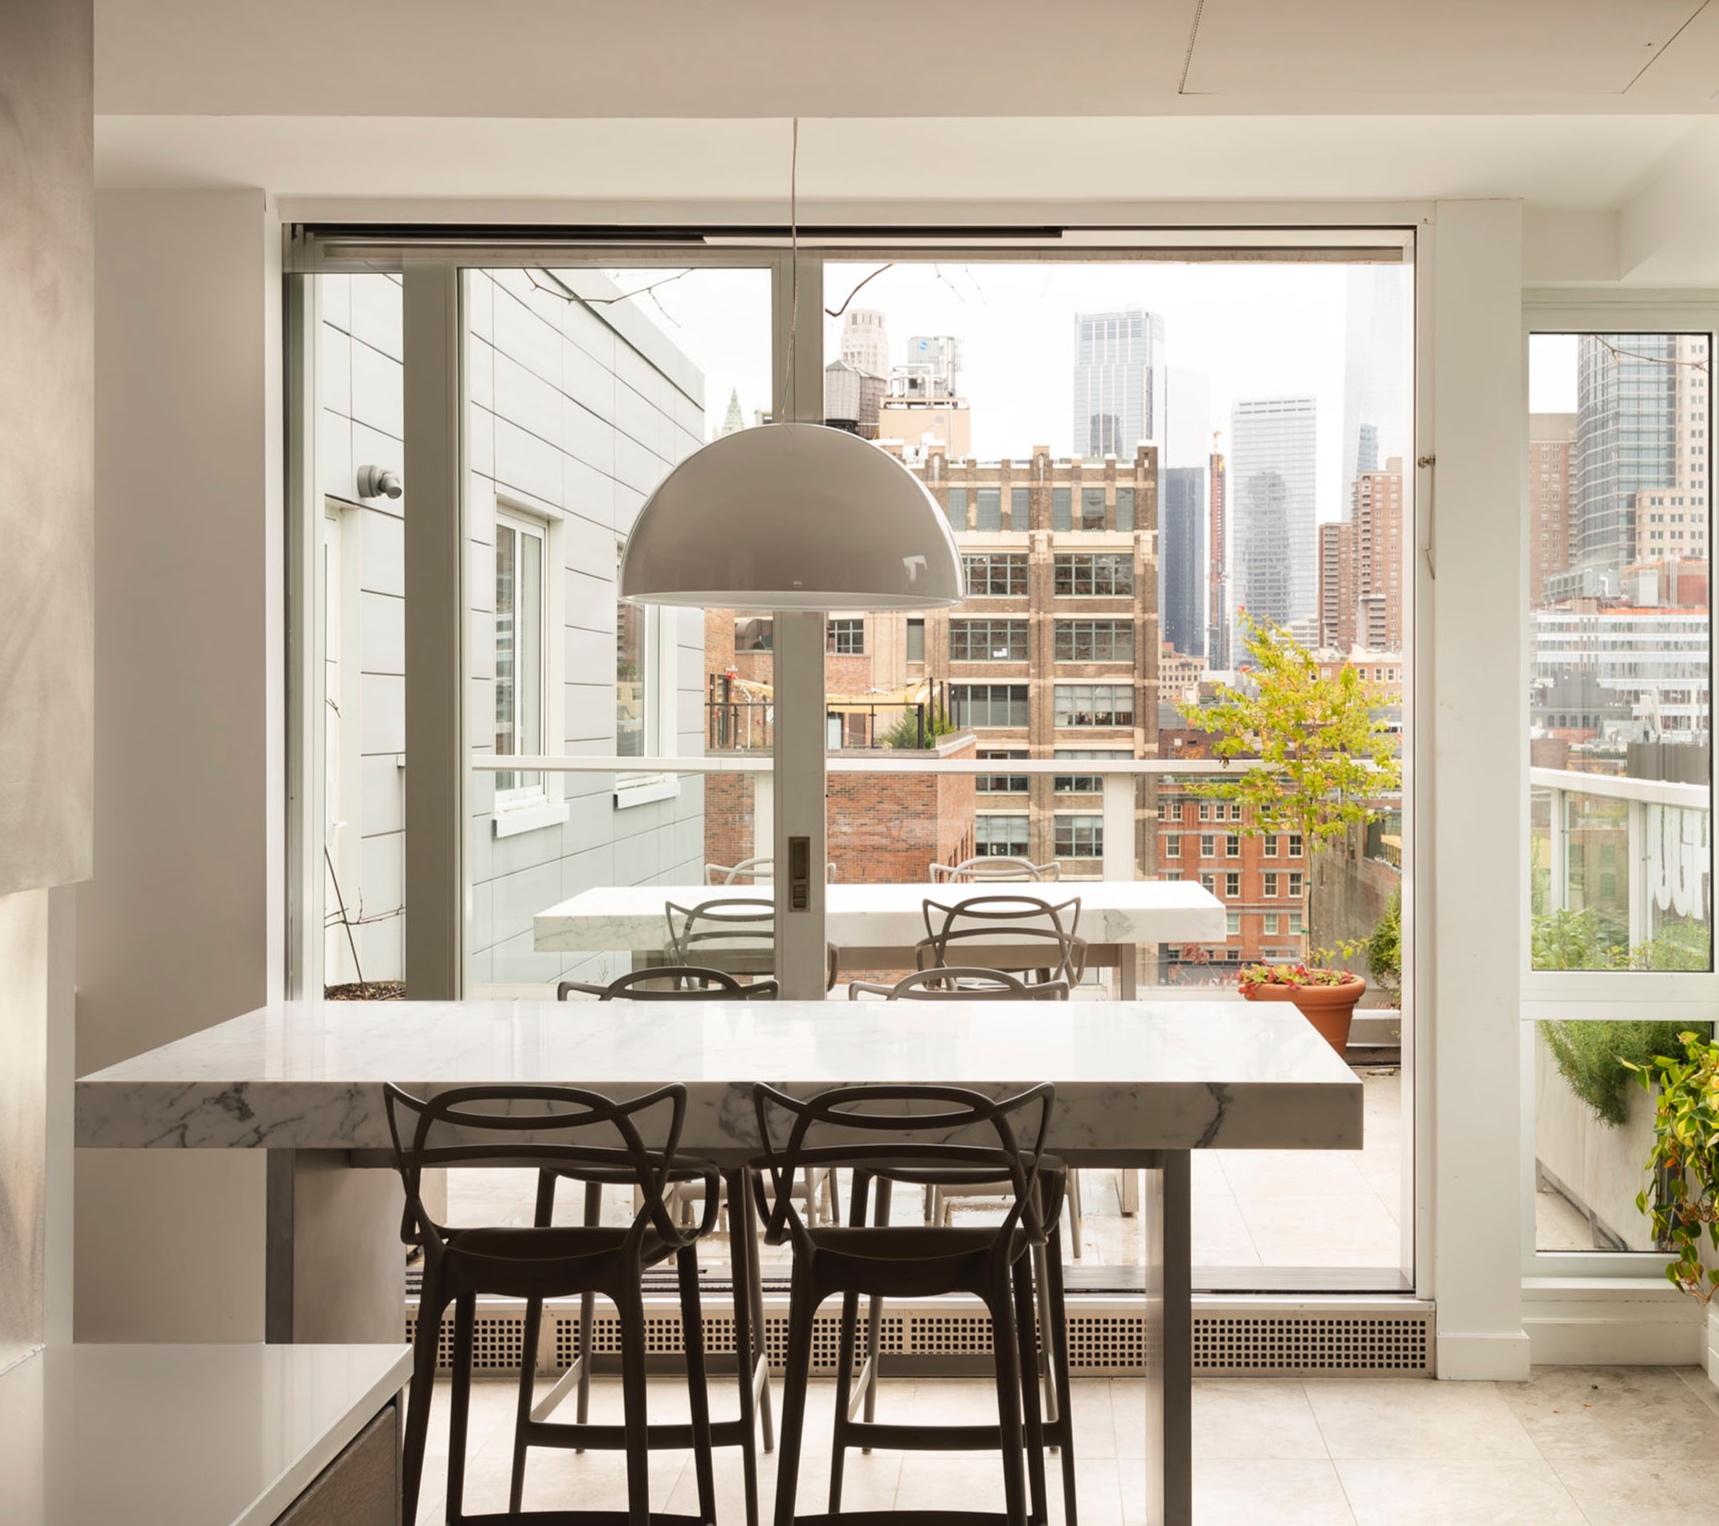 apt+kitchen+table+horizontal+3+copy.jpg